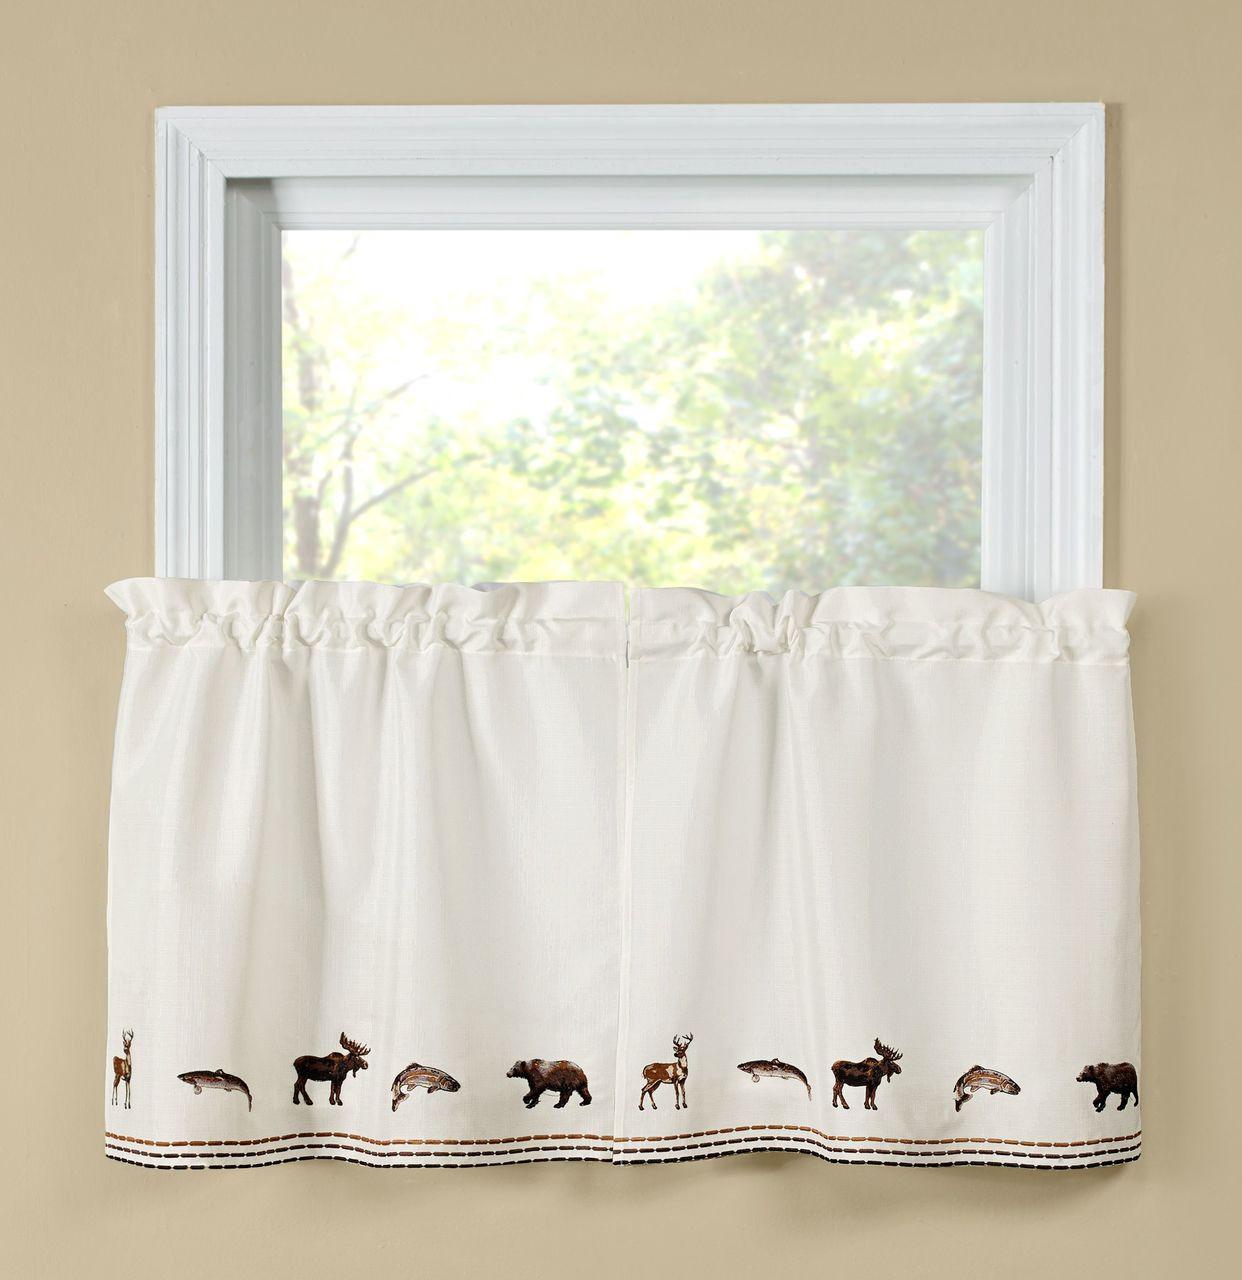 "Lodge 24"" Kitchen Curtain Tier"